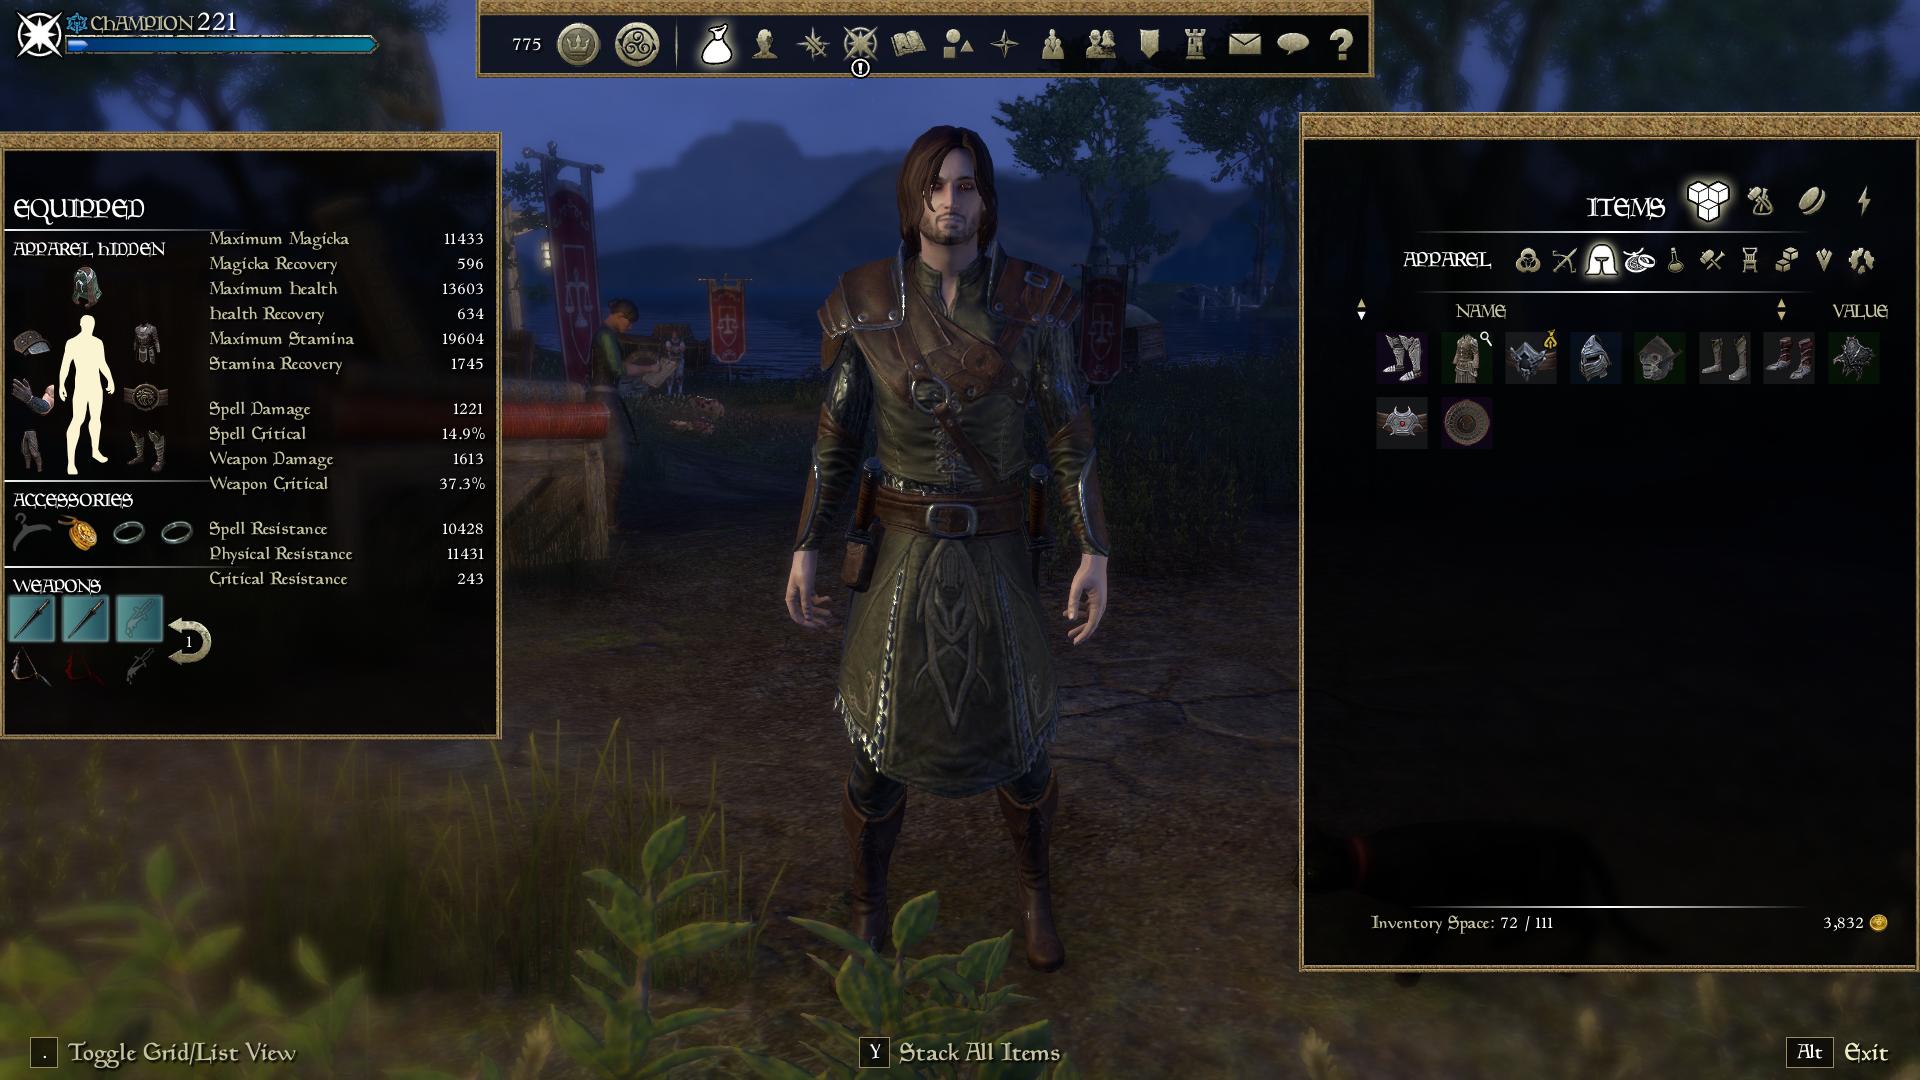 Morrowind Style UI : Graphic UI Mods : Elder Scrolls Online AddOns